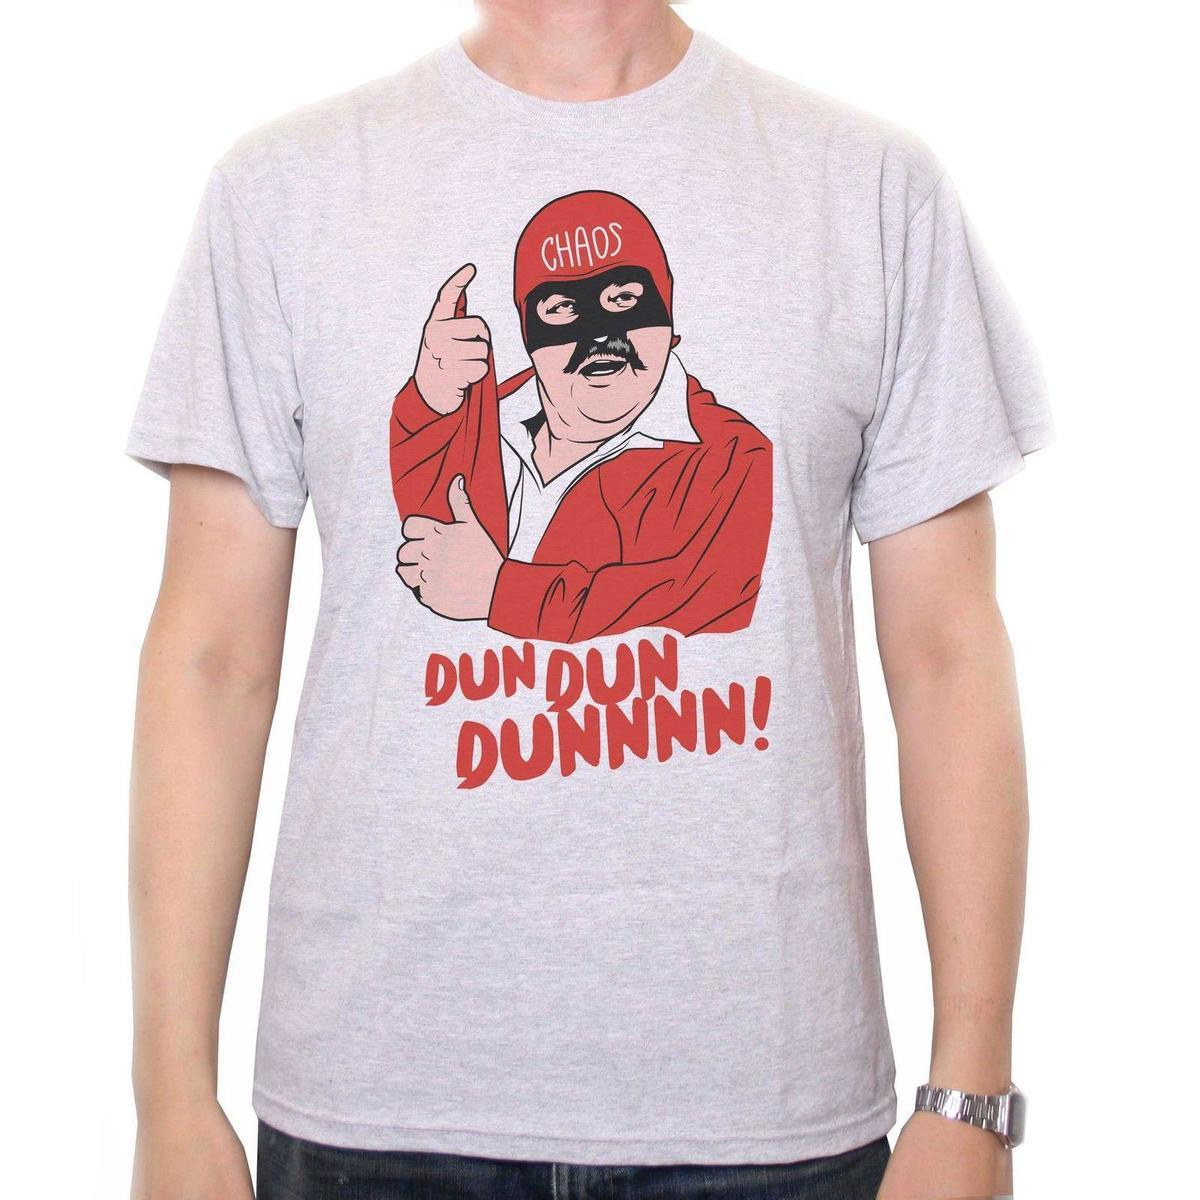 60a04b90e3d Inspired By Cannonball Run T Shirt Captain Chaos Cartoon Cult Movie T Shirt  T Shirt Cool Design T Shirts Online From Linnan004